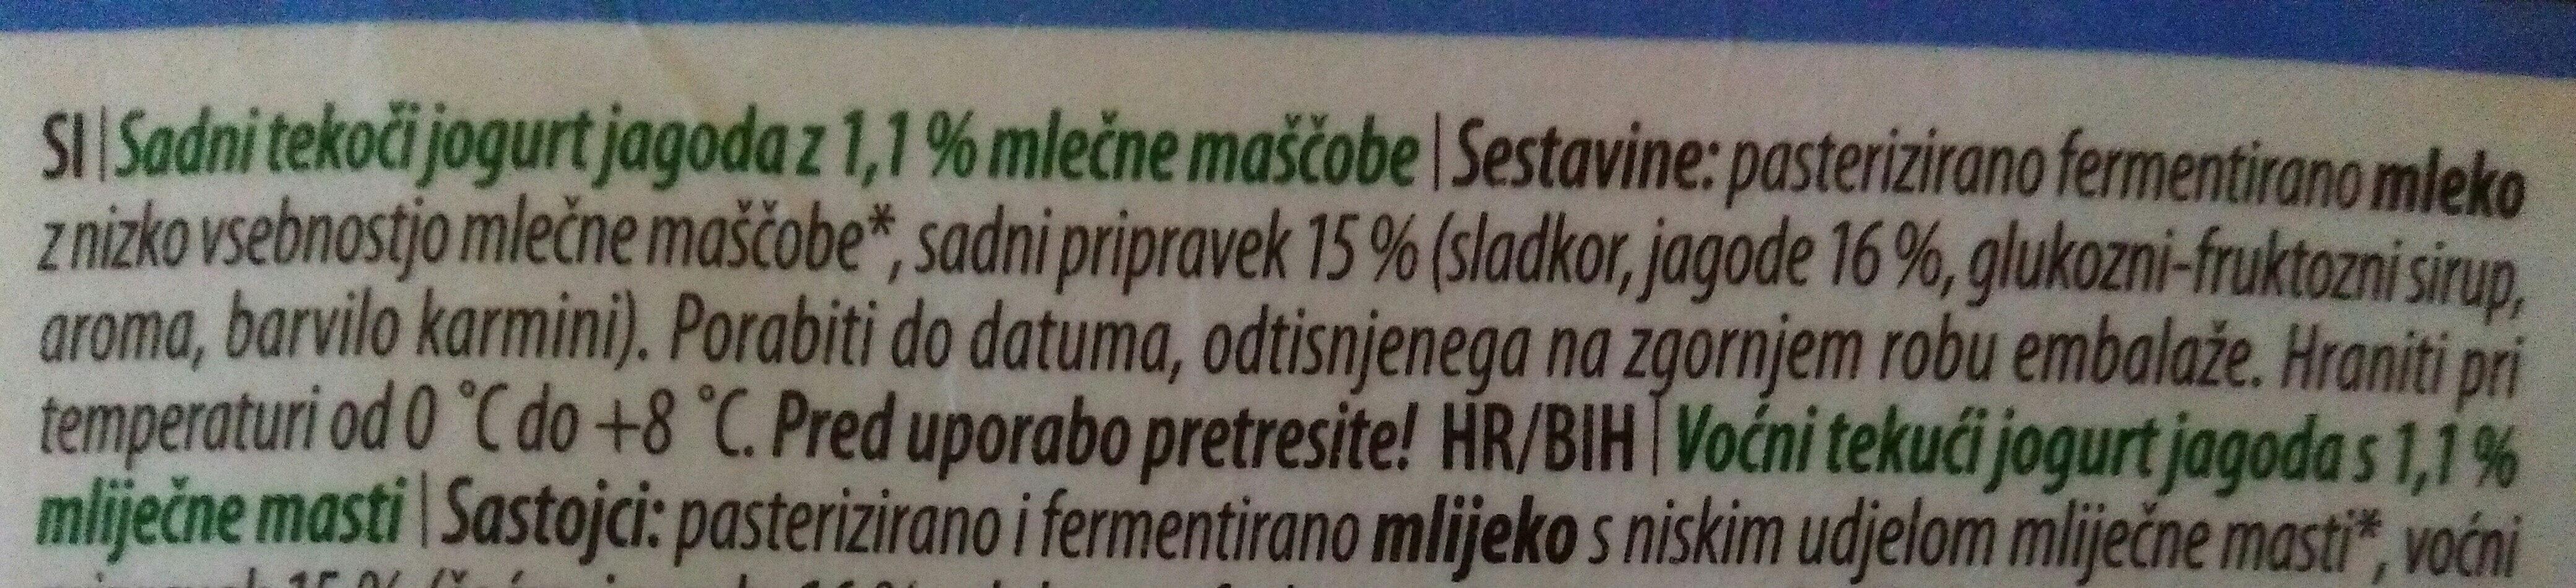 Jogurt jagoda - Ingredients